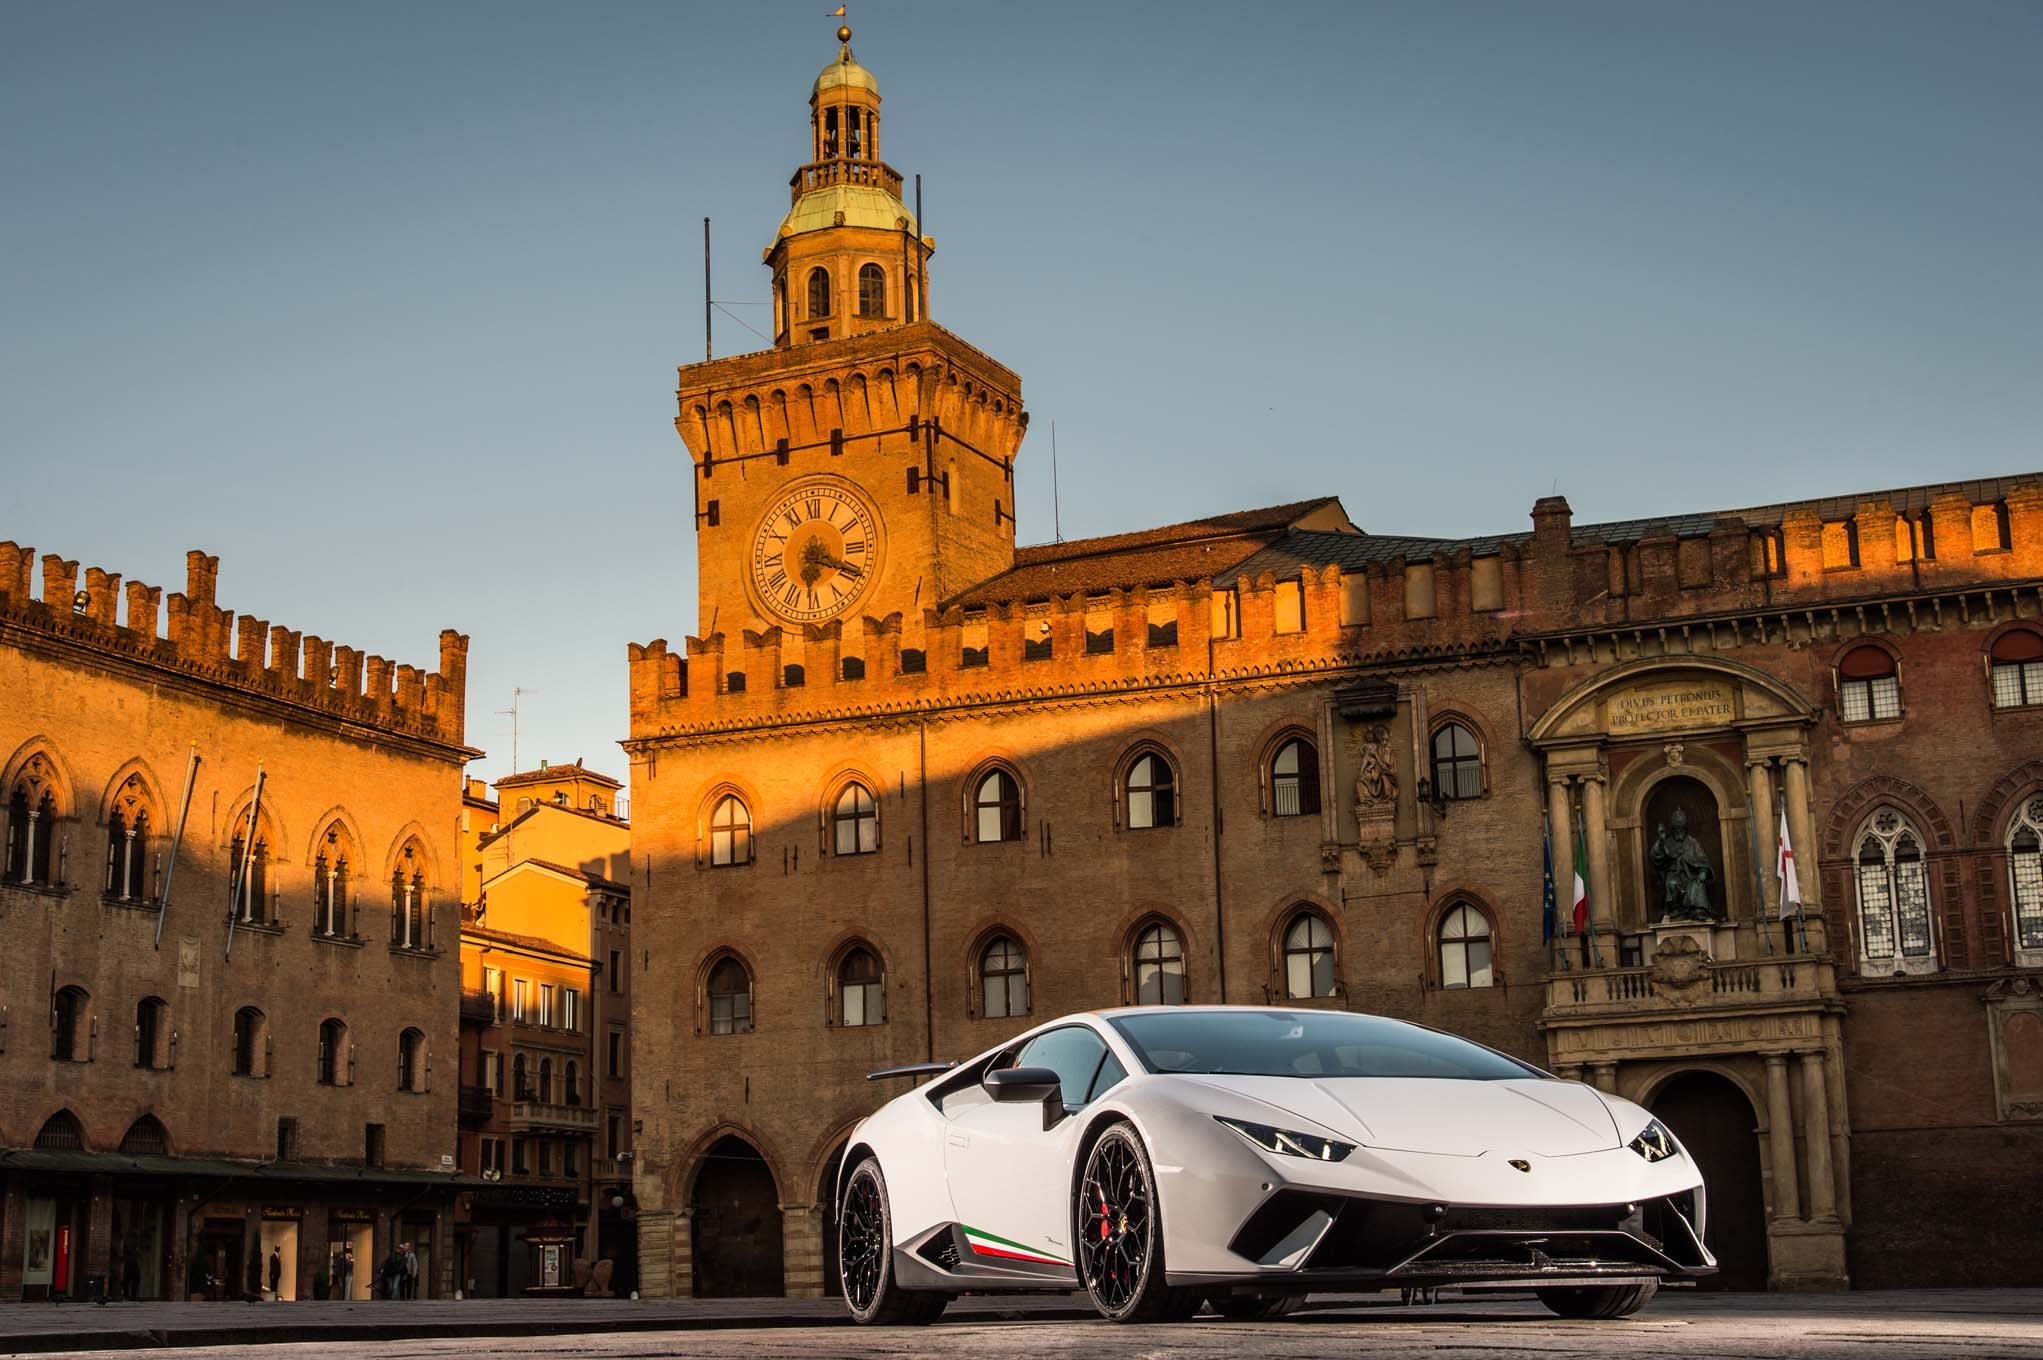 2018 lamborghini orange. Brilliant Lamborghini Show More On 2018 Lamborghini Orange S